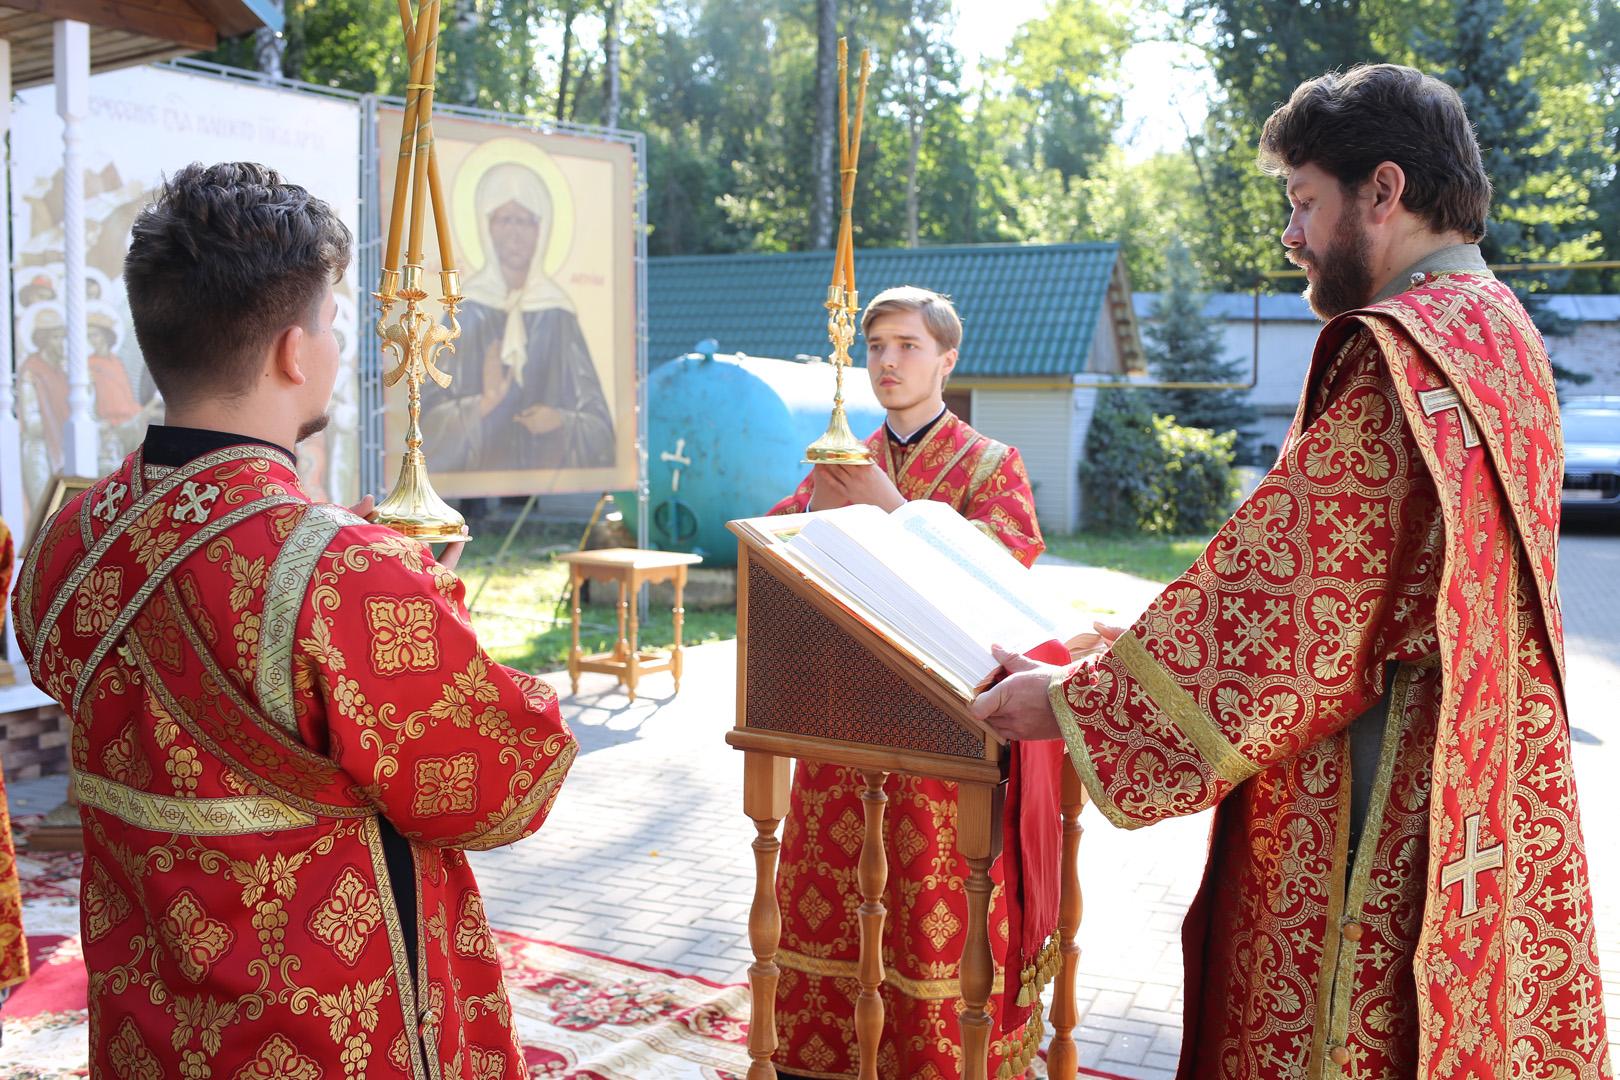 http://monuspen.ru/photoreports/b0408ef58ce532de63b0121cd6c6b60o.jpg